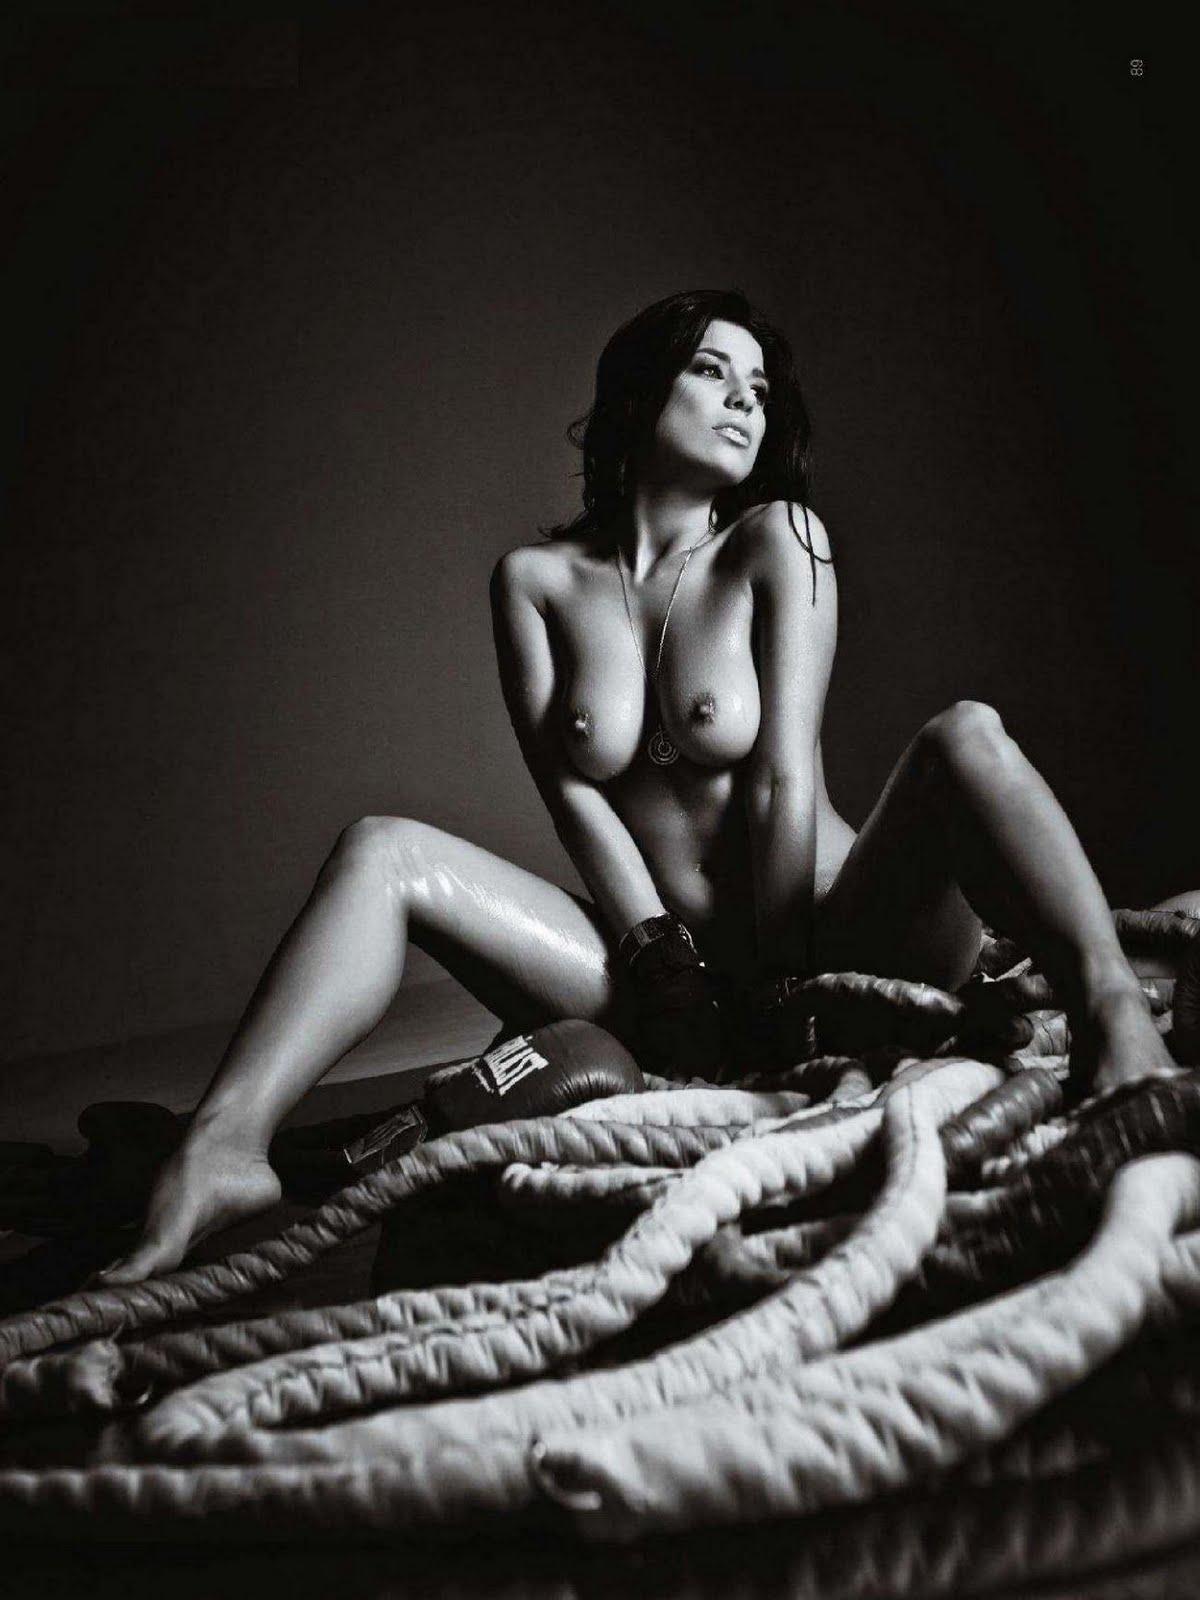 Amazingly! daniella ruah naked agree, remarkable